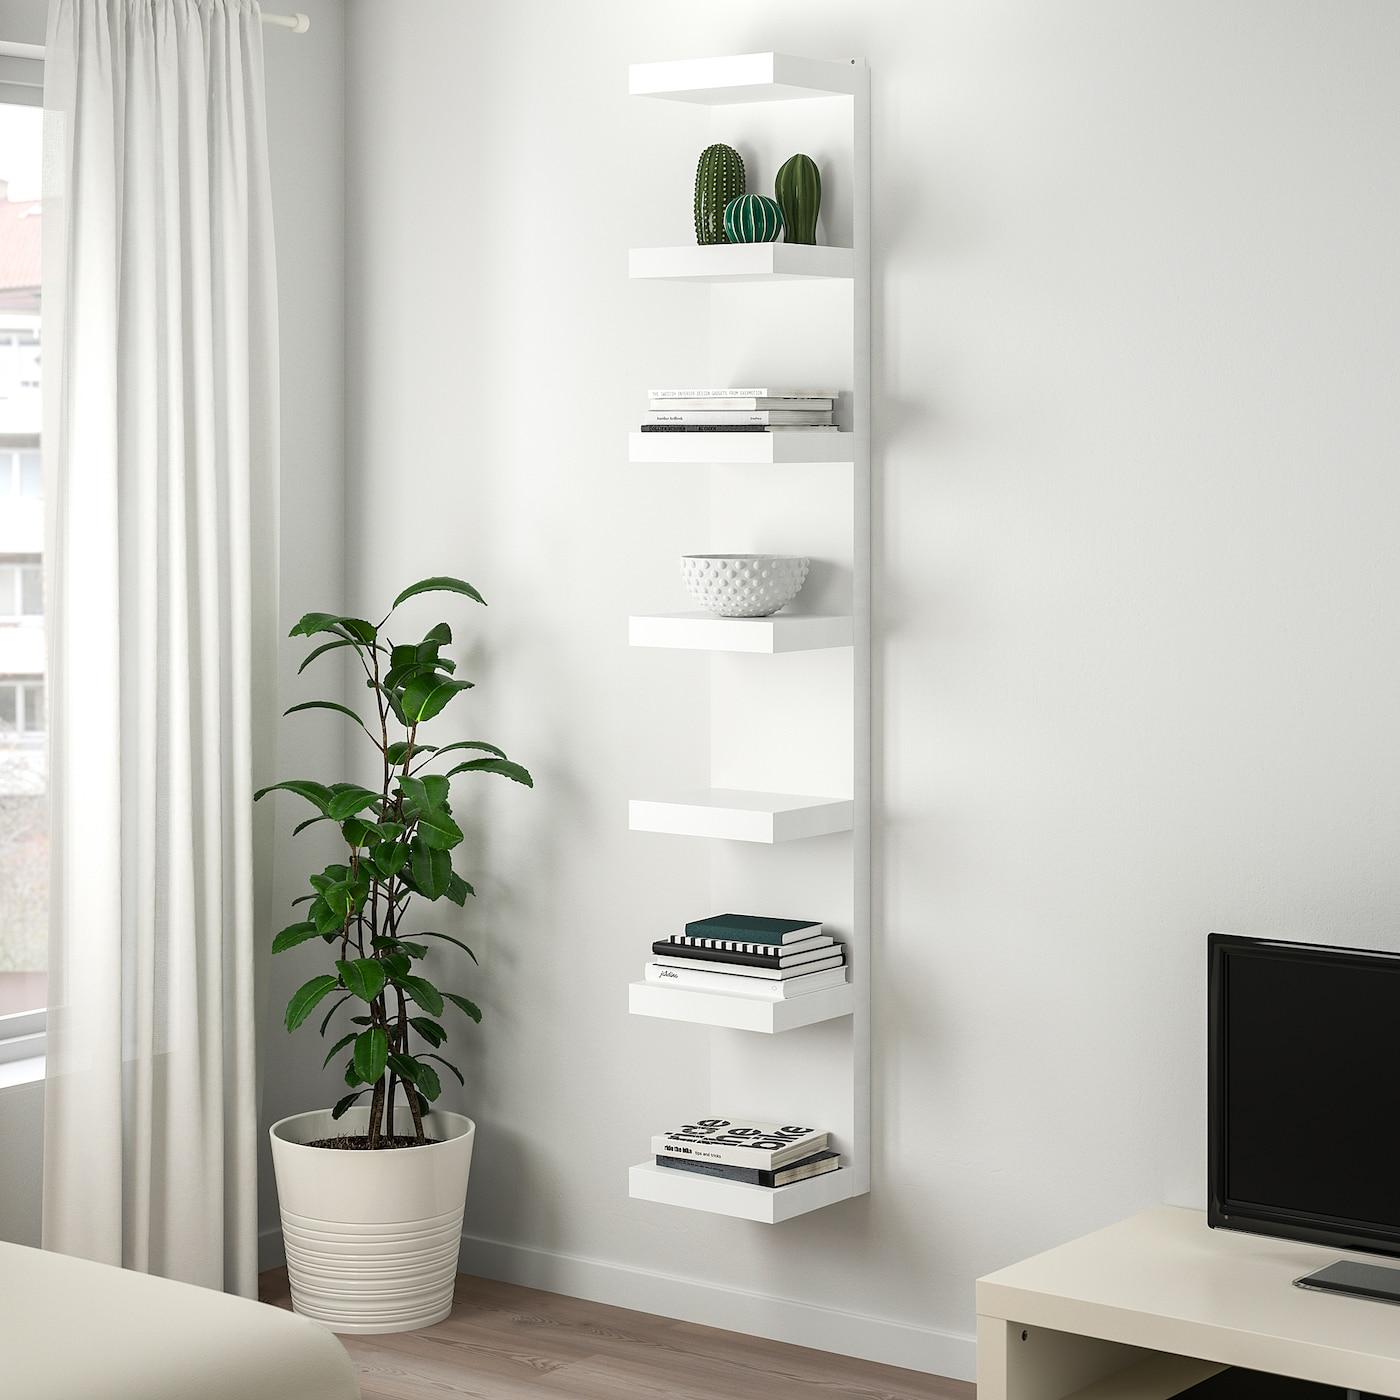 LACK Wall shelf unit - white 3x3 cm